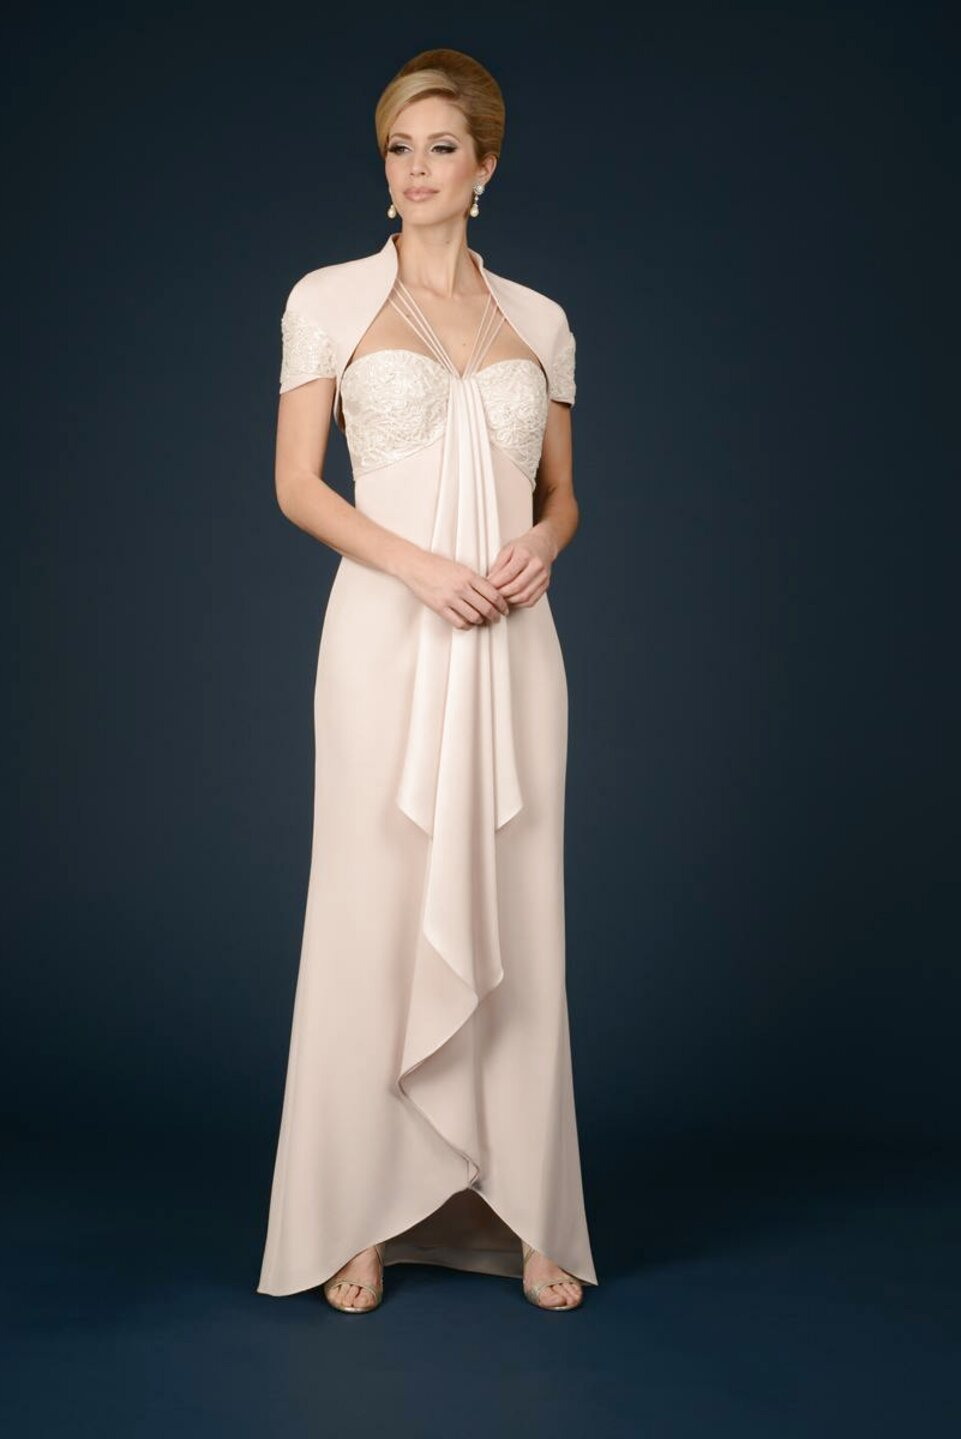 la femme dress for sale